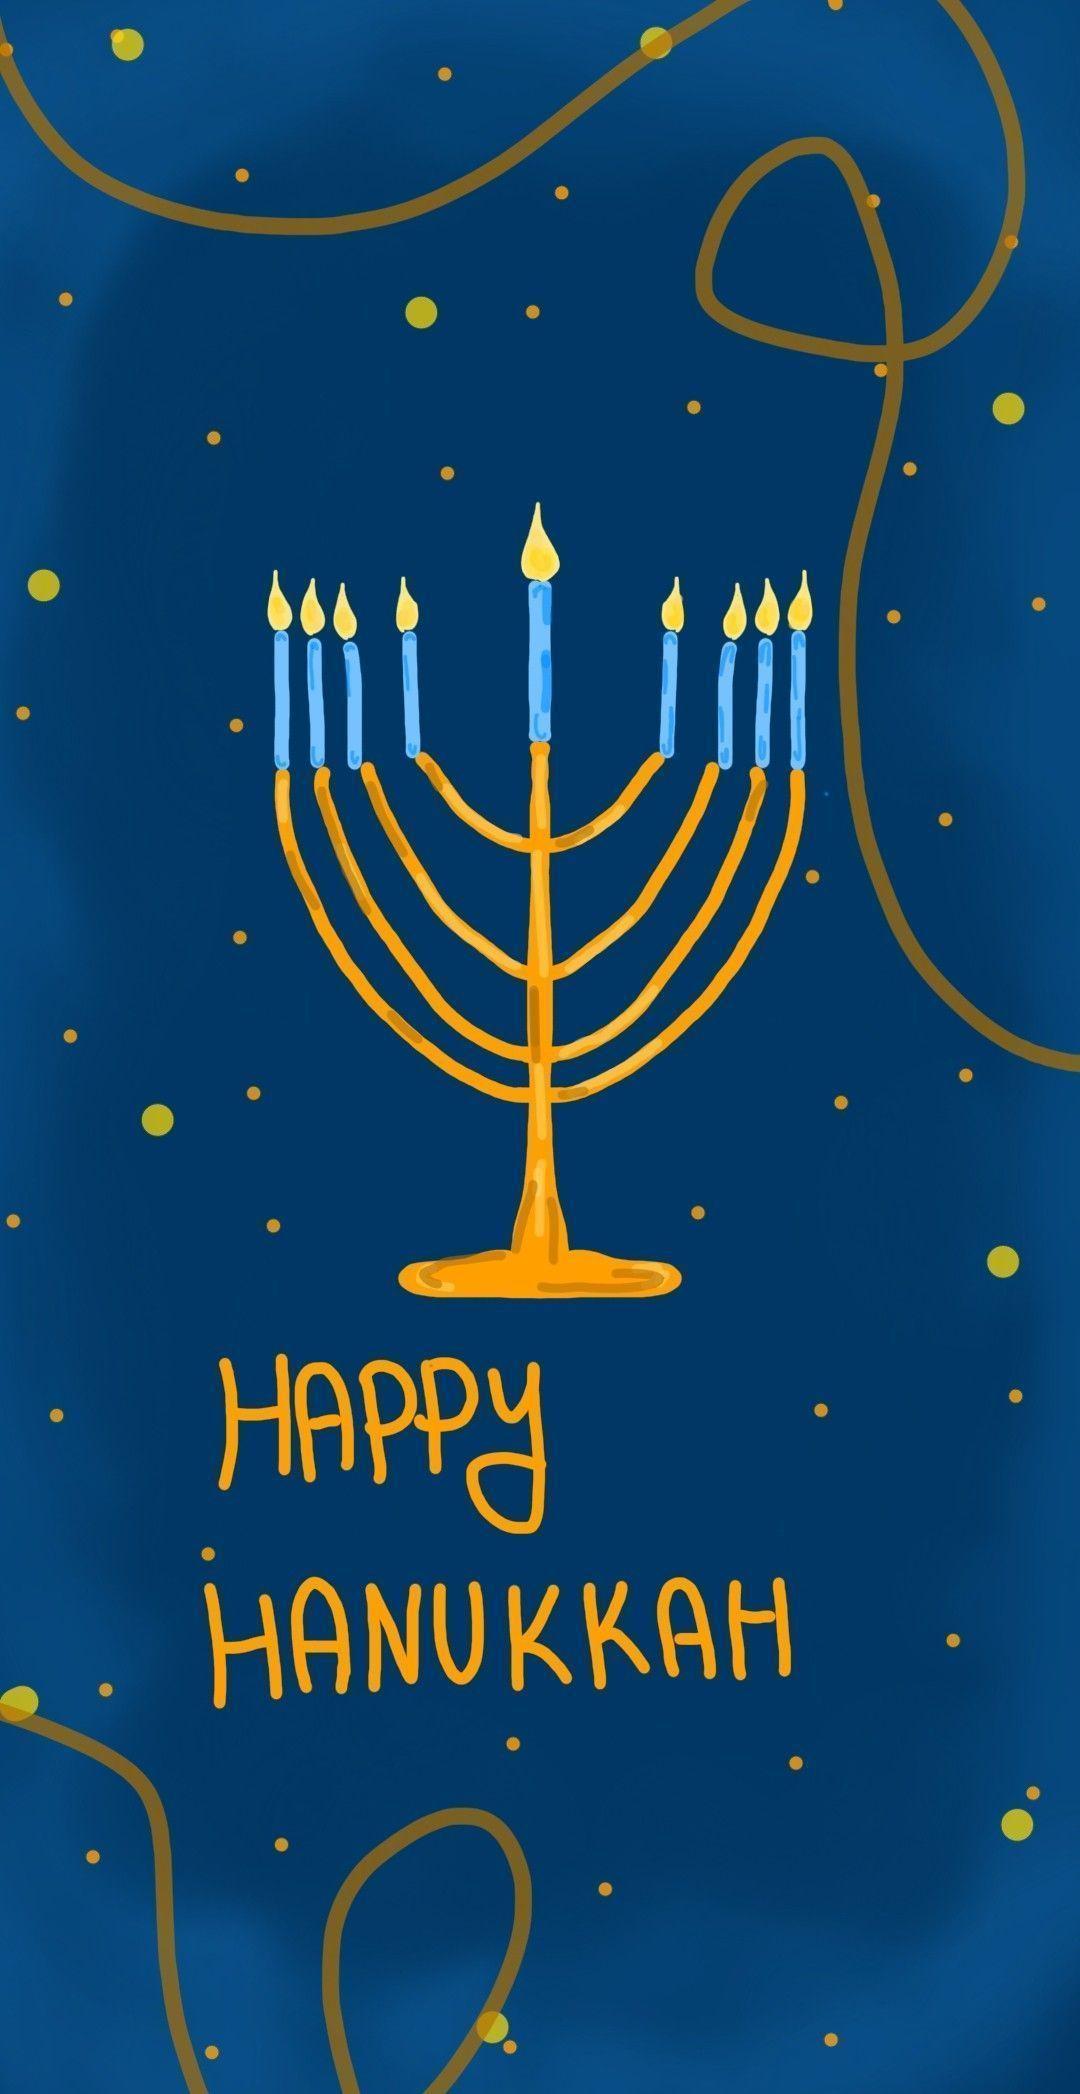 Hanukkah Wallpaper Holidays Hanukkah Wallpaper Holidays Hanukkah Hanukkahw Hanukkah Wallpaper Holidays Hanukk Happy Hanukkah Holiday Meme Hanukkah